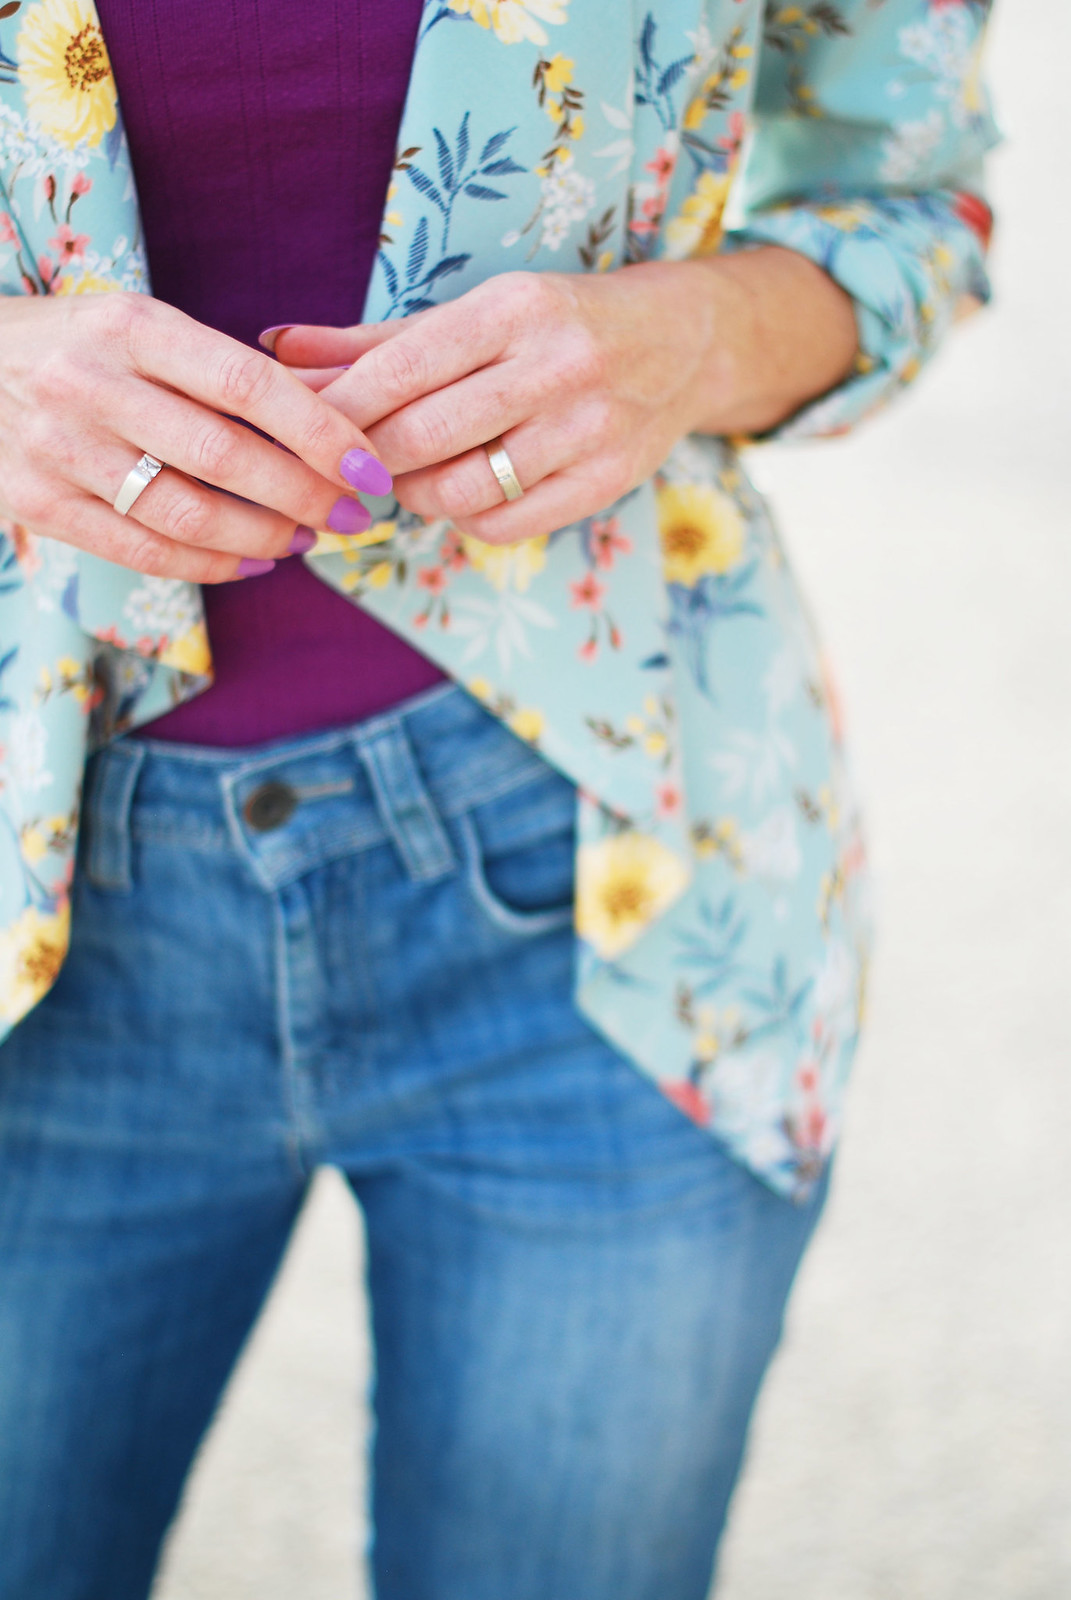 Casual Spring Summer look: Floral drape jacket, purple tank, boyfriend jeans   Not Dressed As Lamb